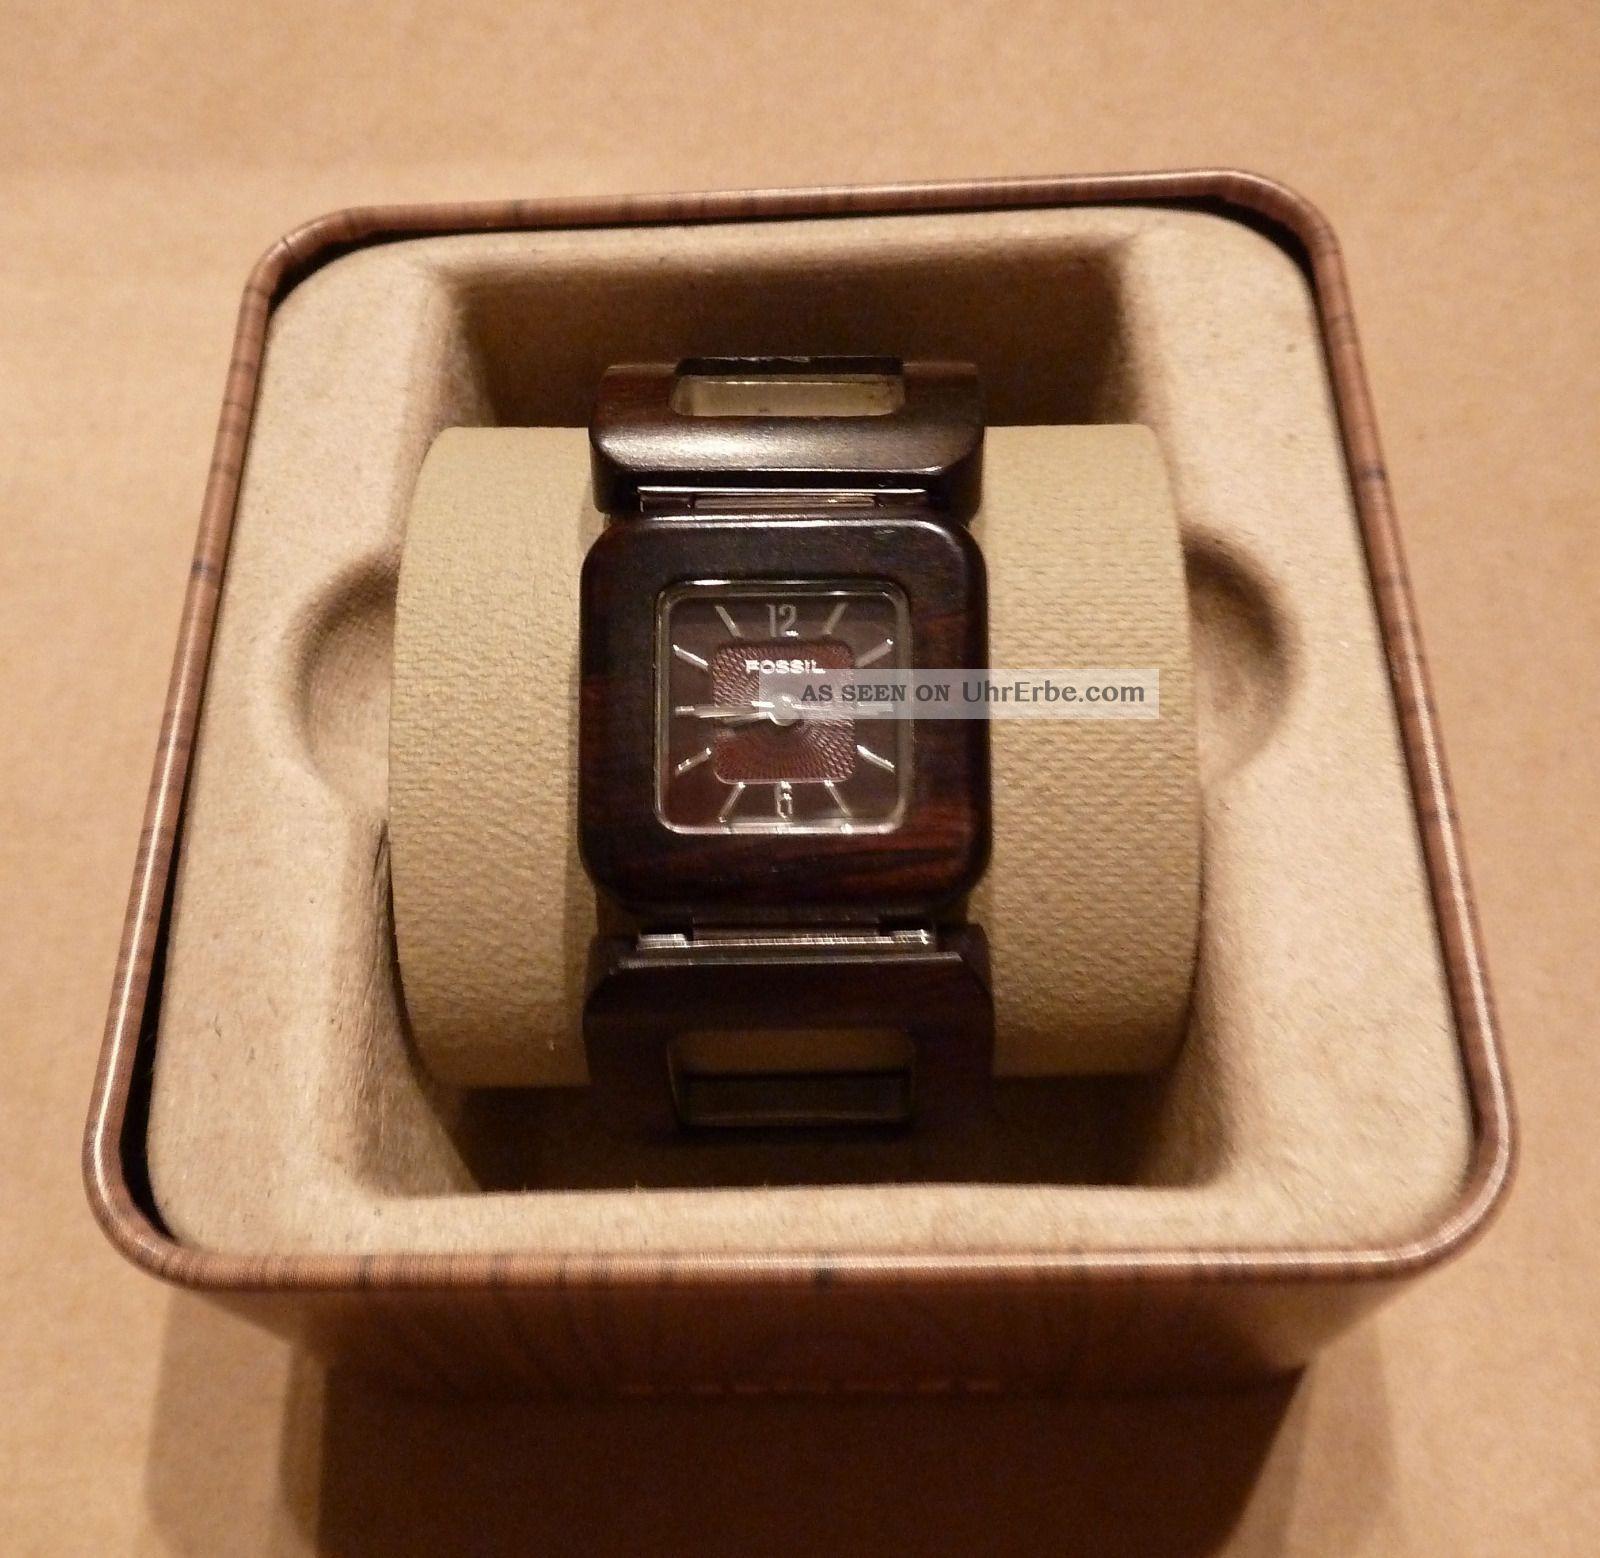 Fossil Armbanduhr Damen Holz ~ Fossil Damen Uhr Braun Holz Armbanduhren Bild